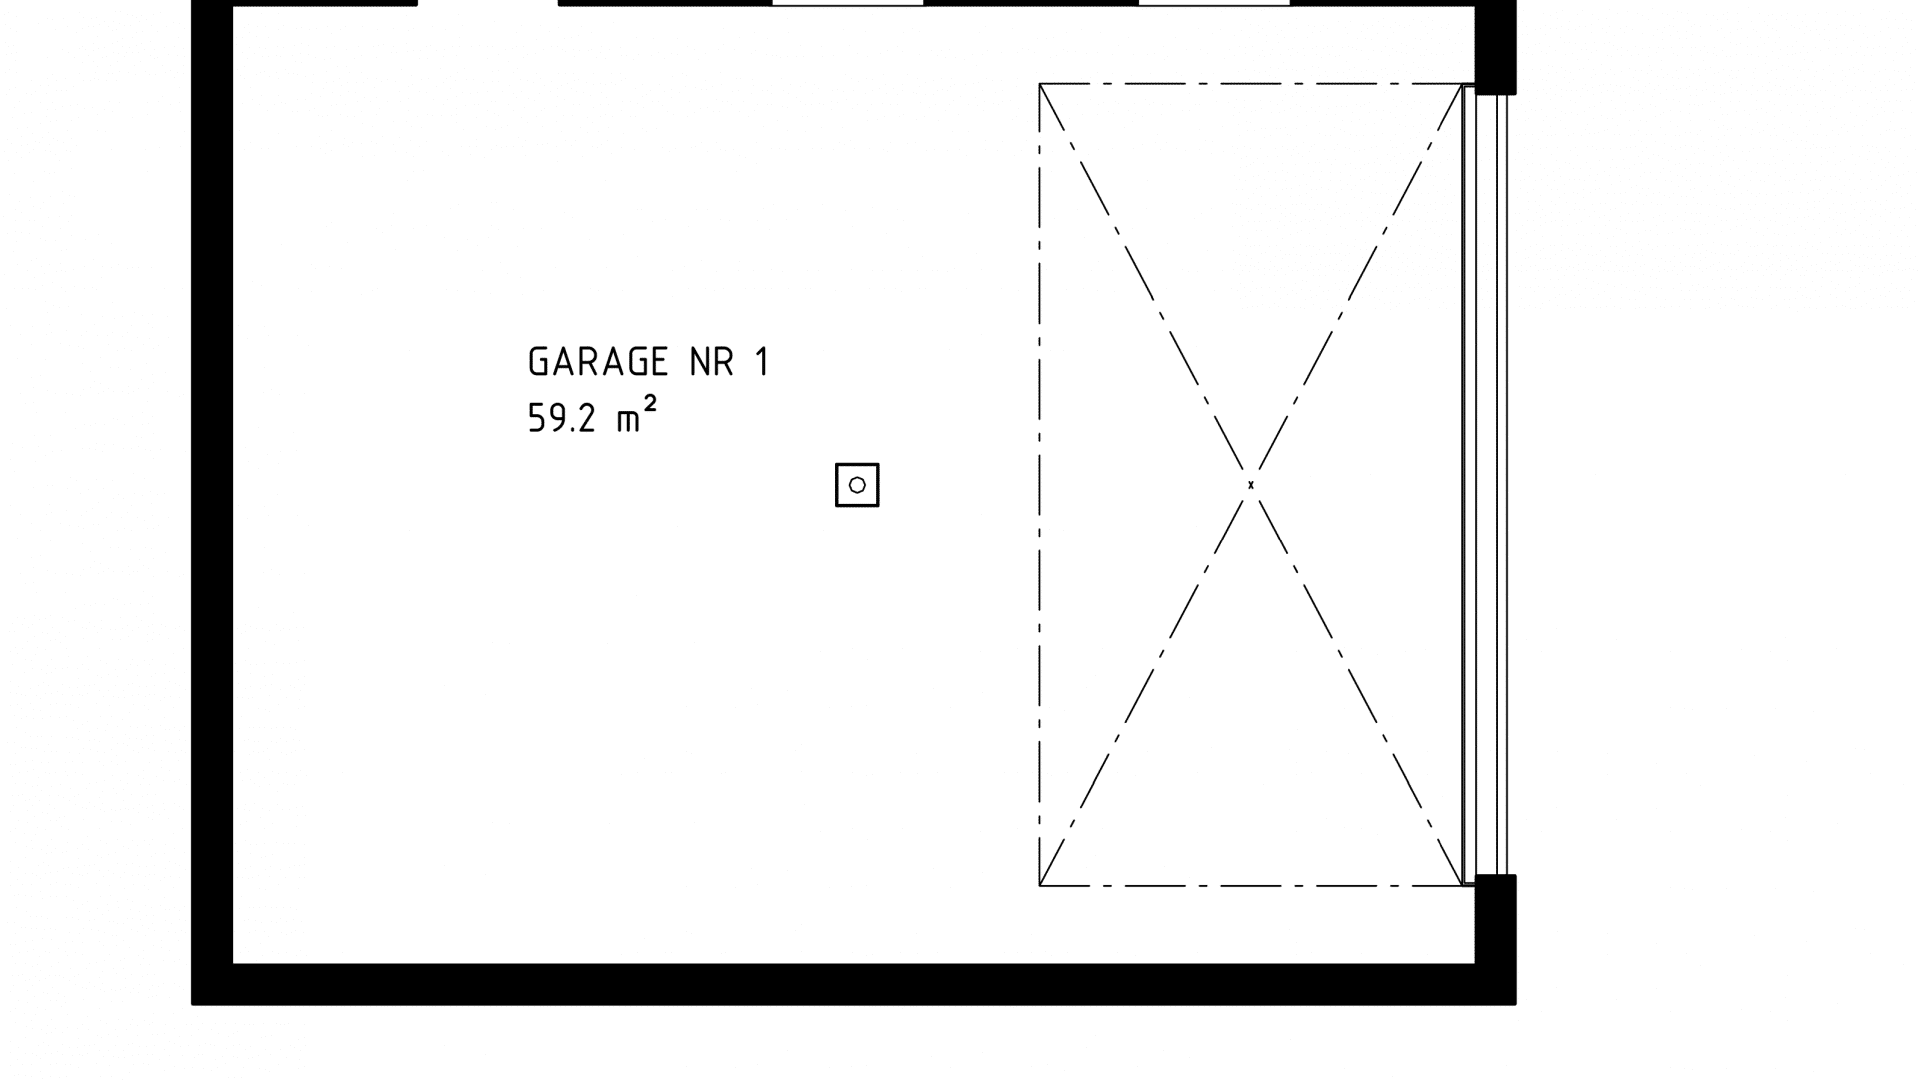 Garage 3D vy nr 1